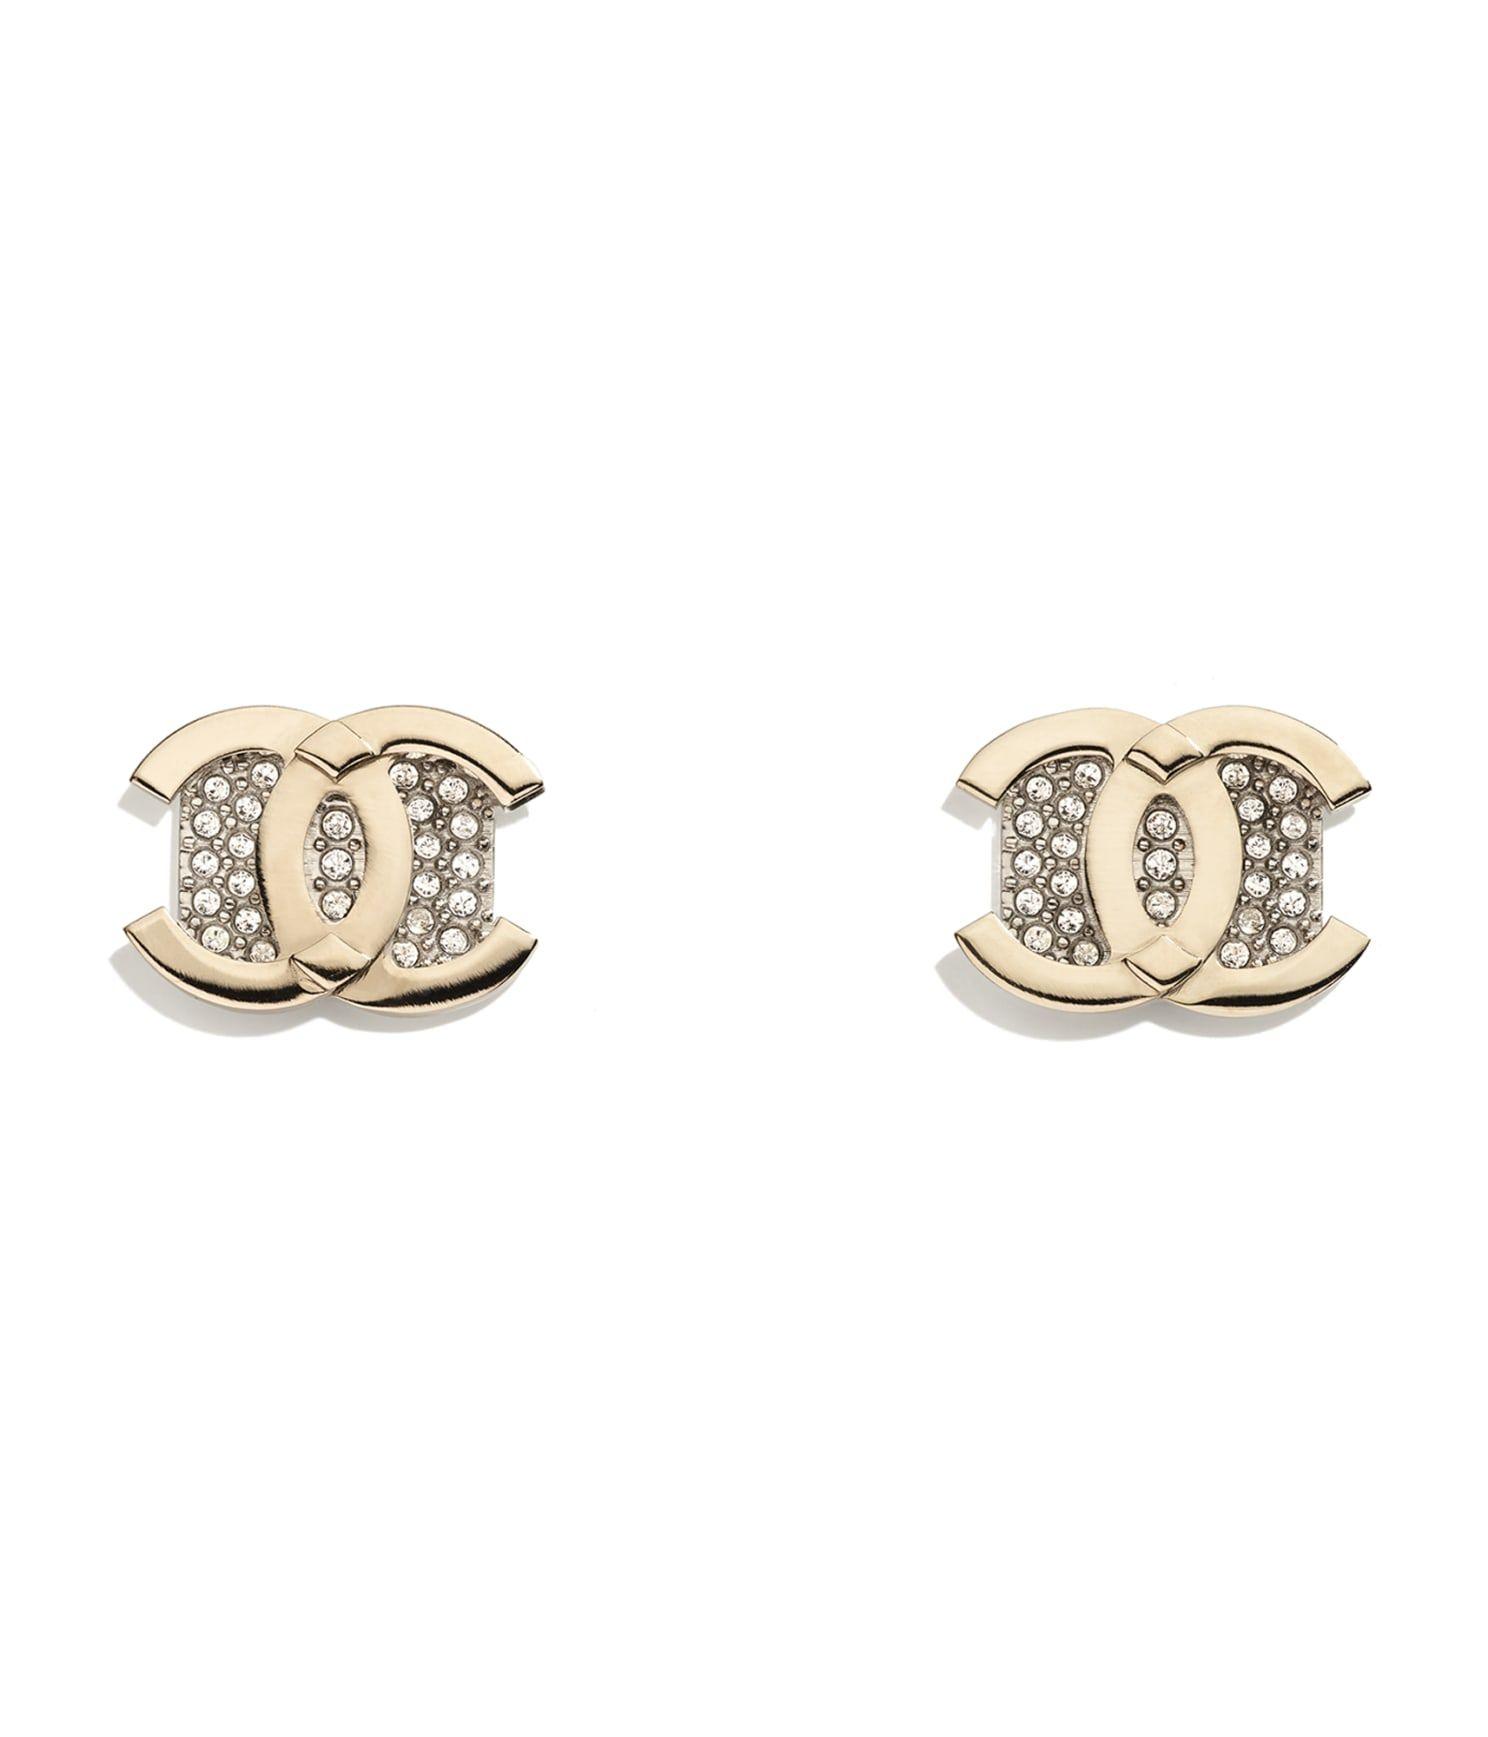 CHANEL 金屬水晶耳環,建議售價 NT$13,500